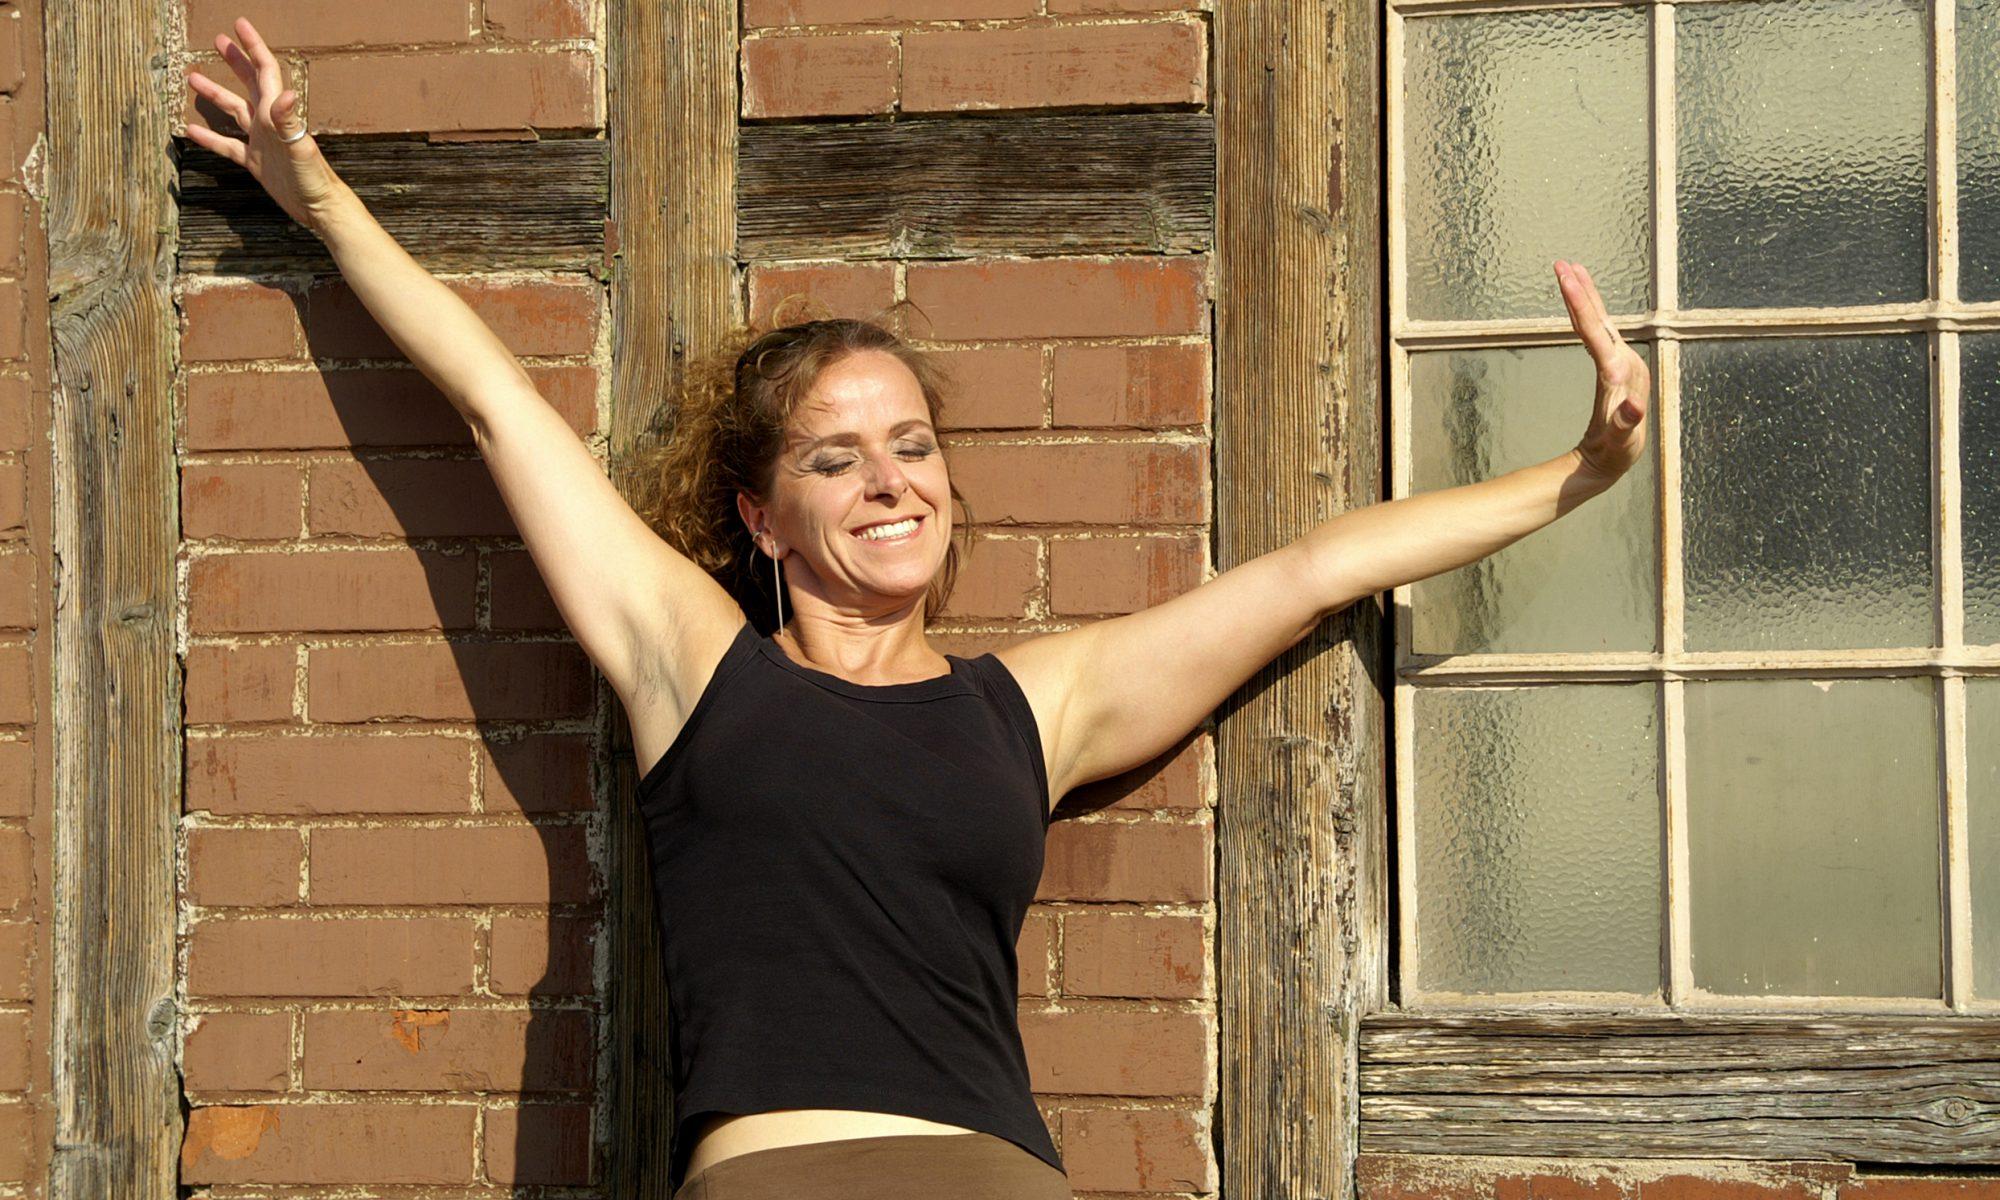 Nicole Haas